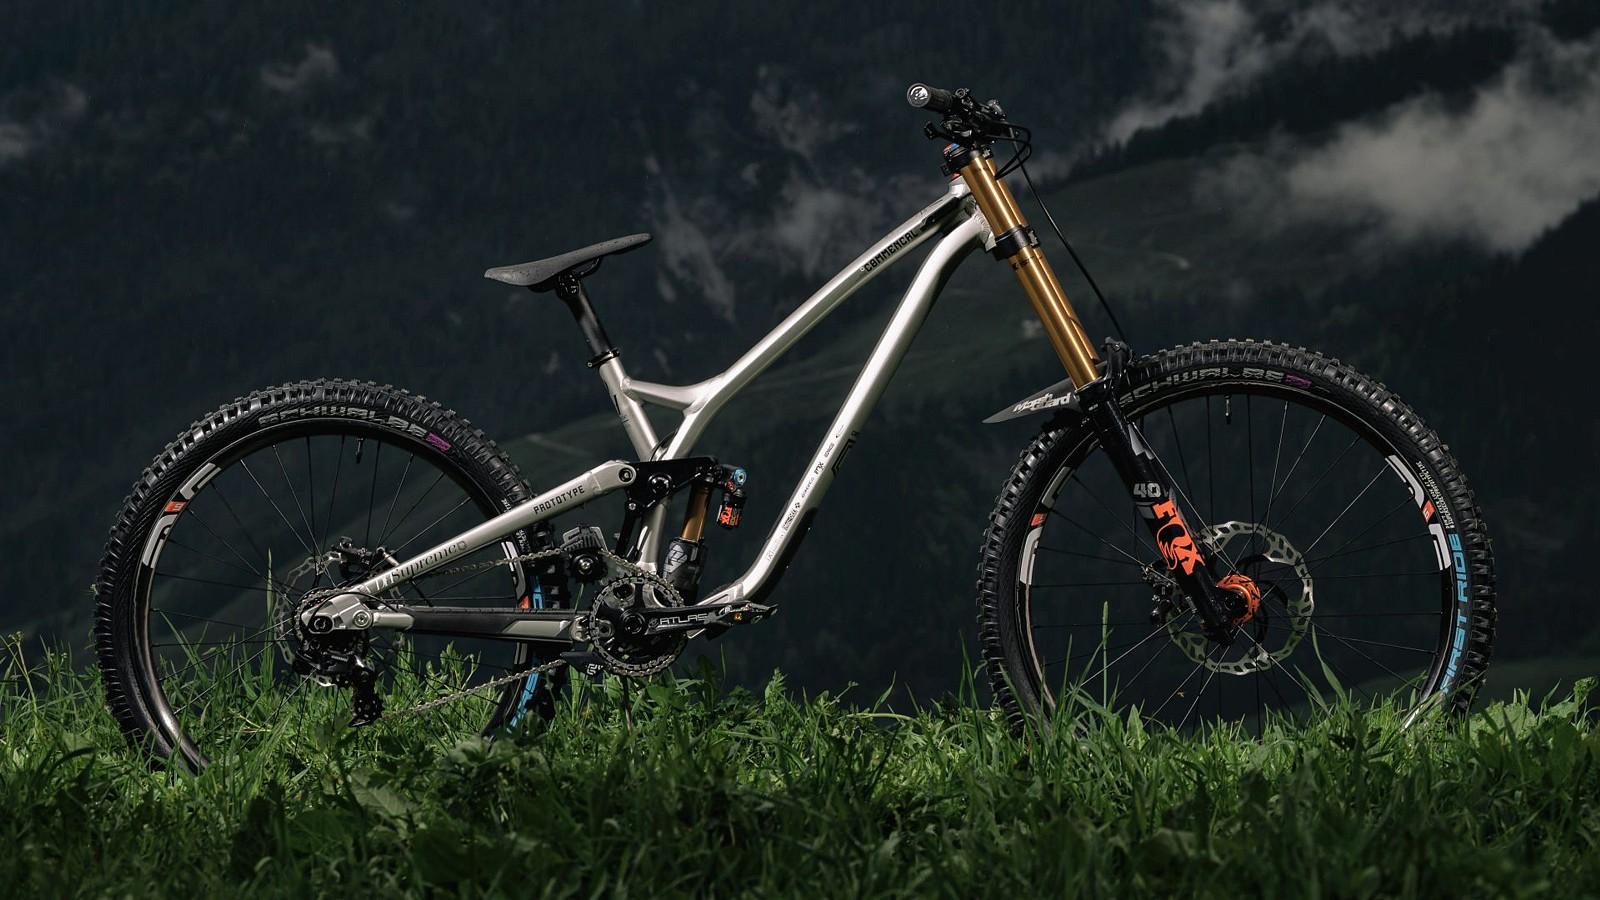 Commencal Virtual High Pivot Prototype DH Bike - Commencal Virtual High Pivot Prototype DH Bike - Mountain Biking Pictures - Vital MTB